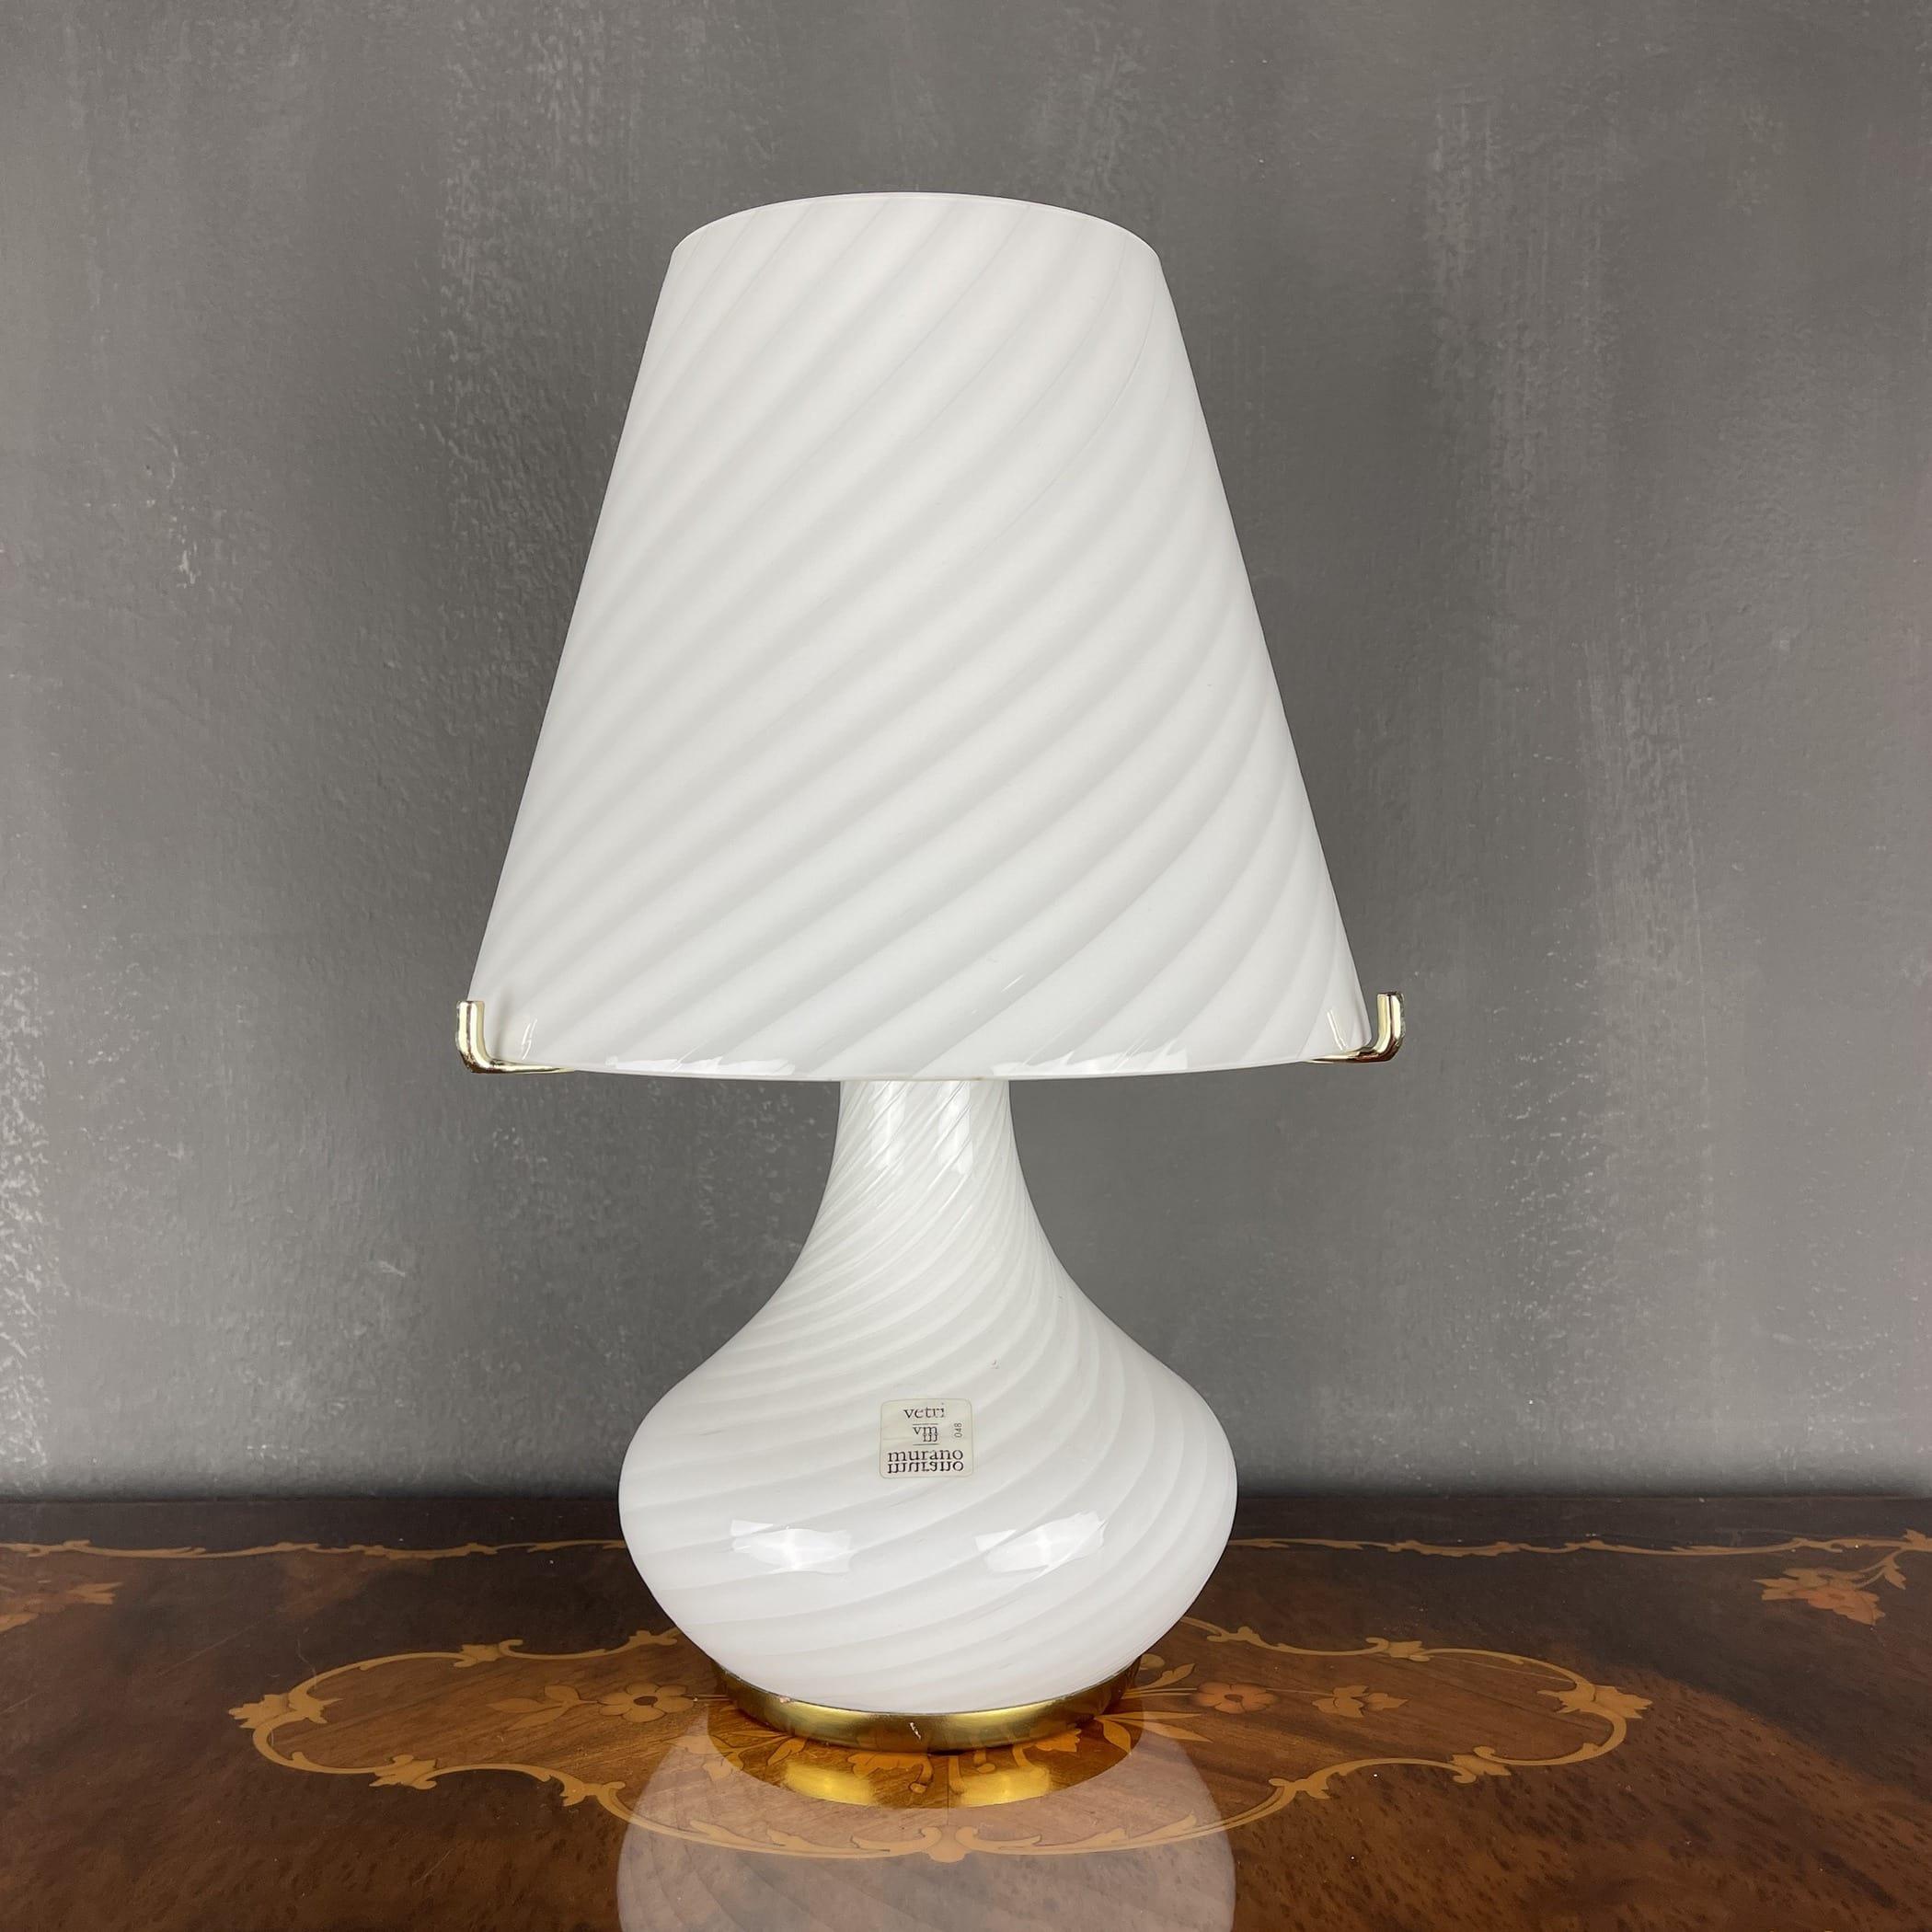 XL Murano Vetri swirl mushroom table lamp Italy 1970s